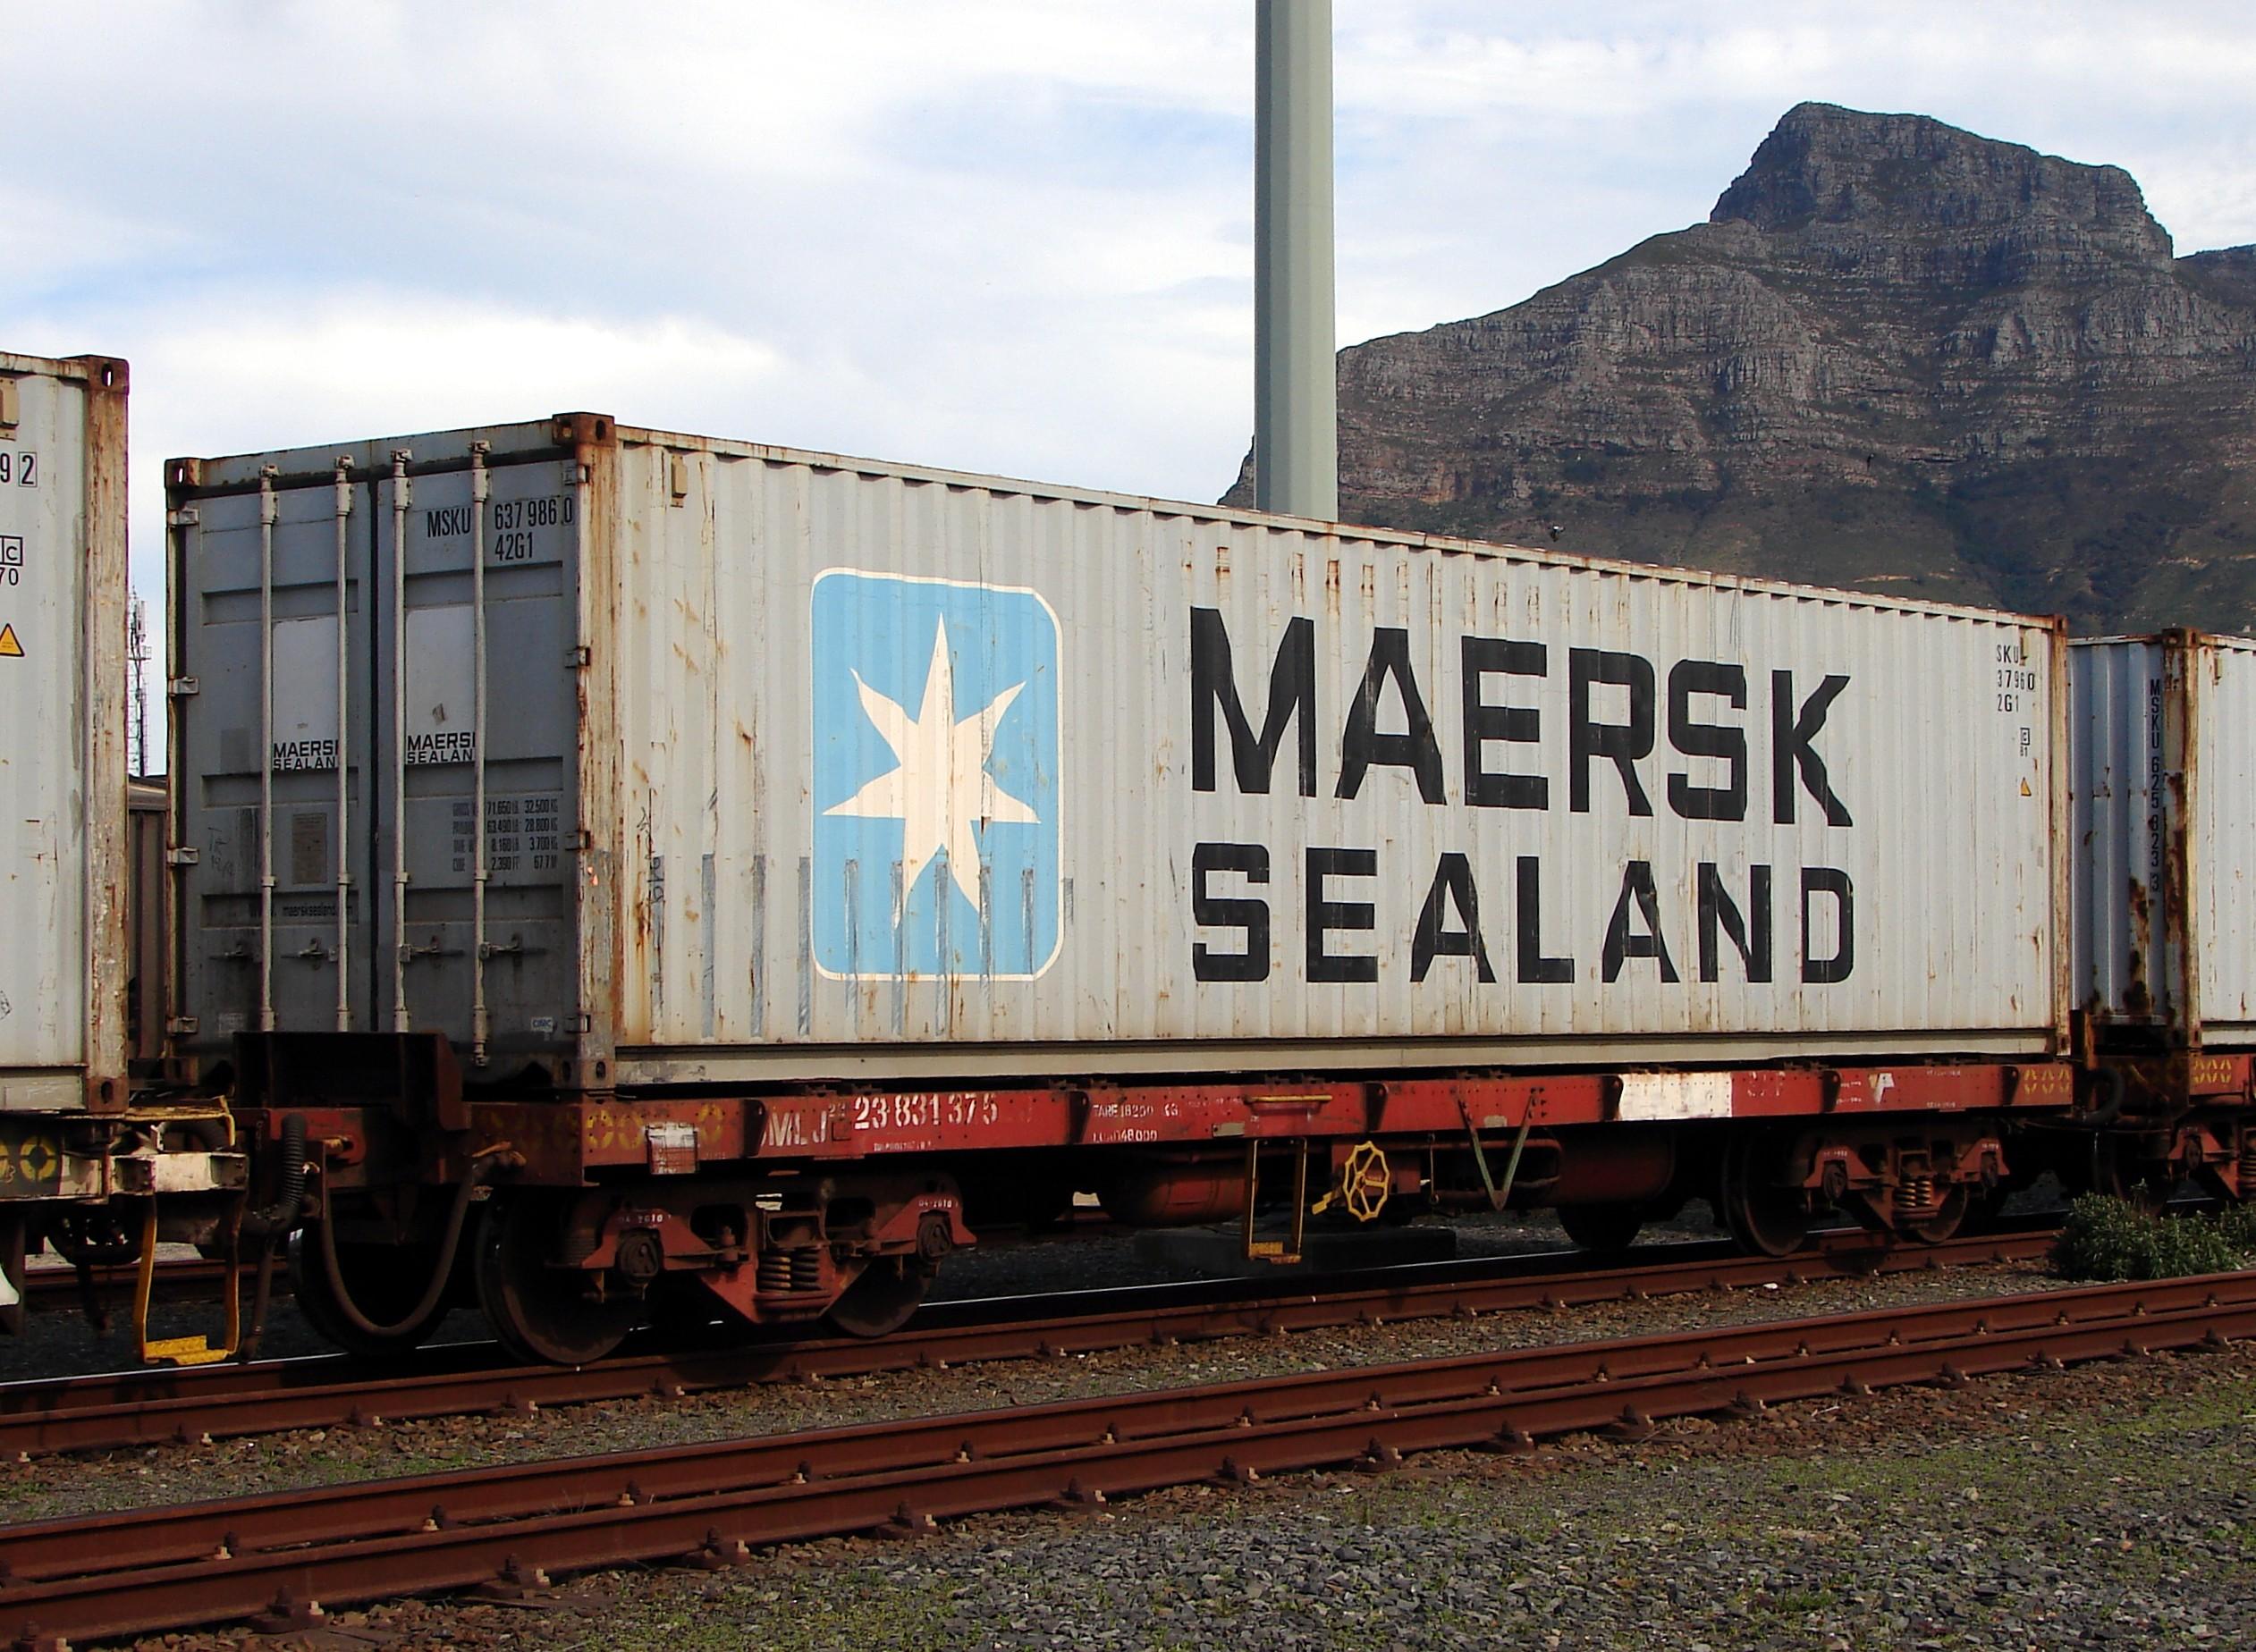 File:Maersk SeaLand 42G1 MSKU 637986 0 jpg - Wikimedia Commons